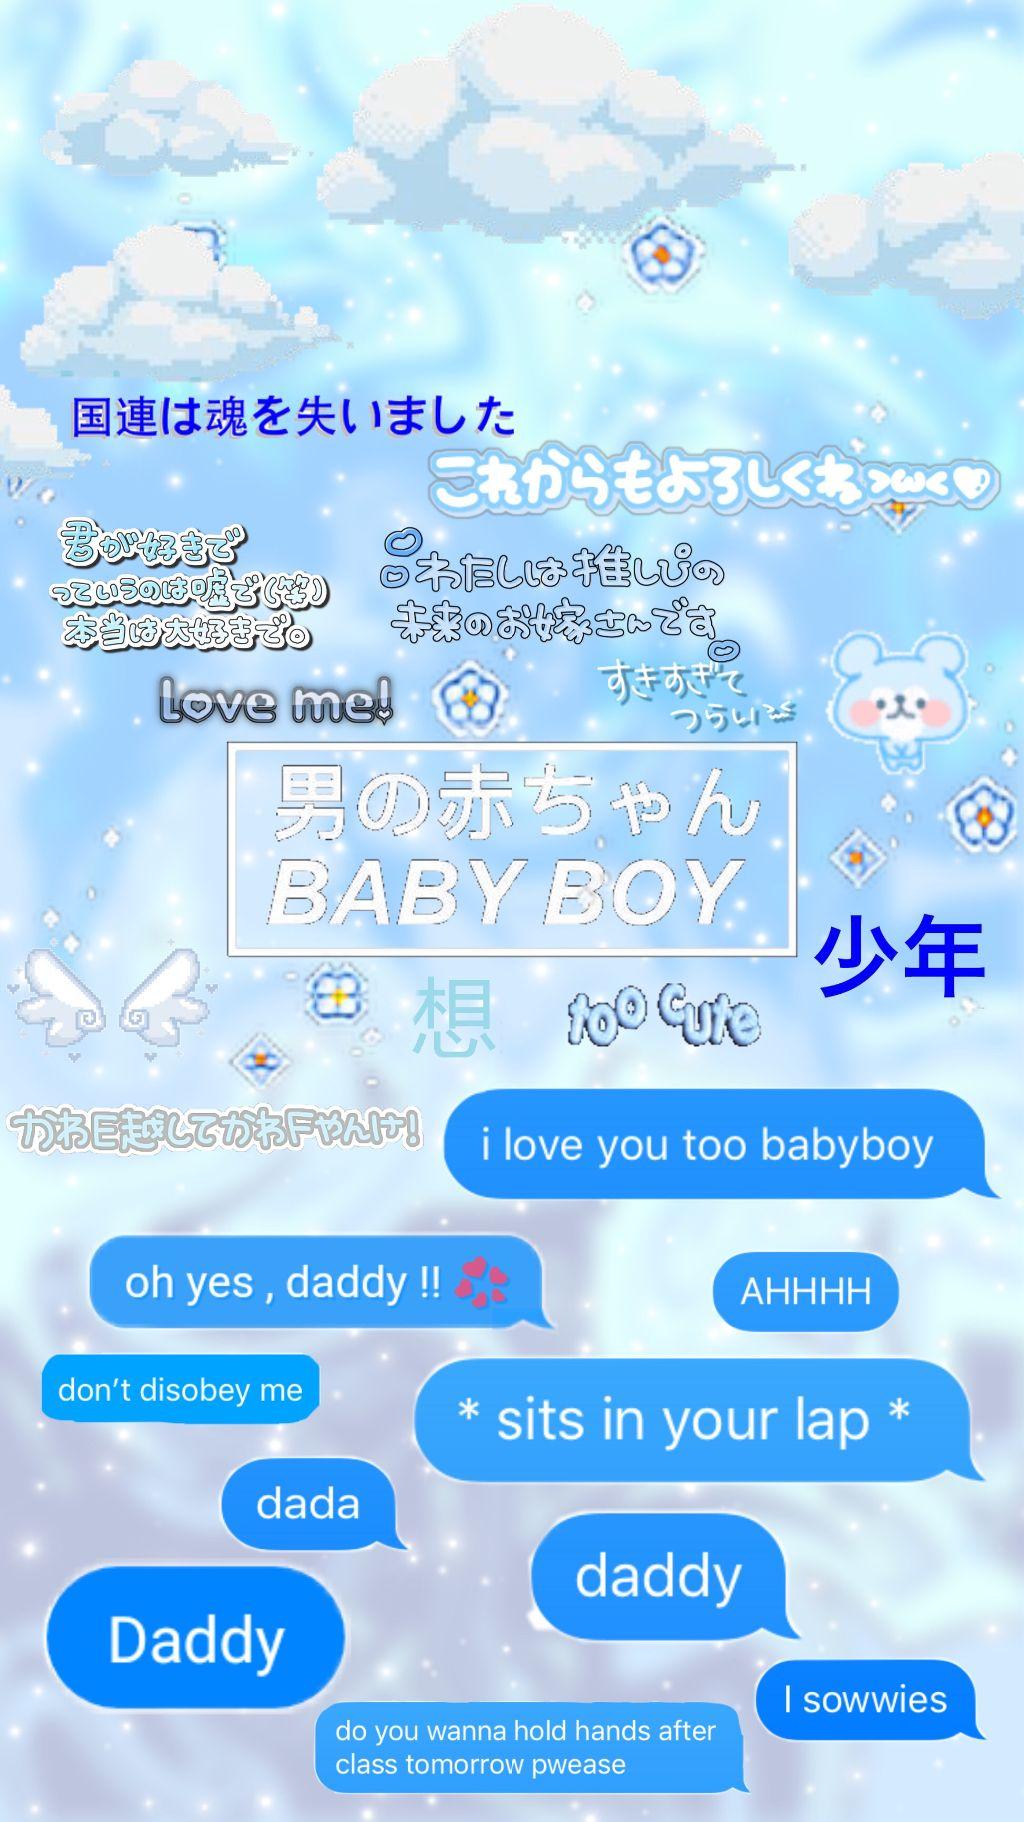 babyboy ddlb ddlg littlespace wallpaper background free